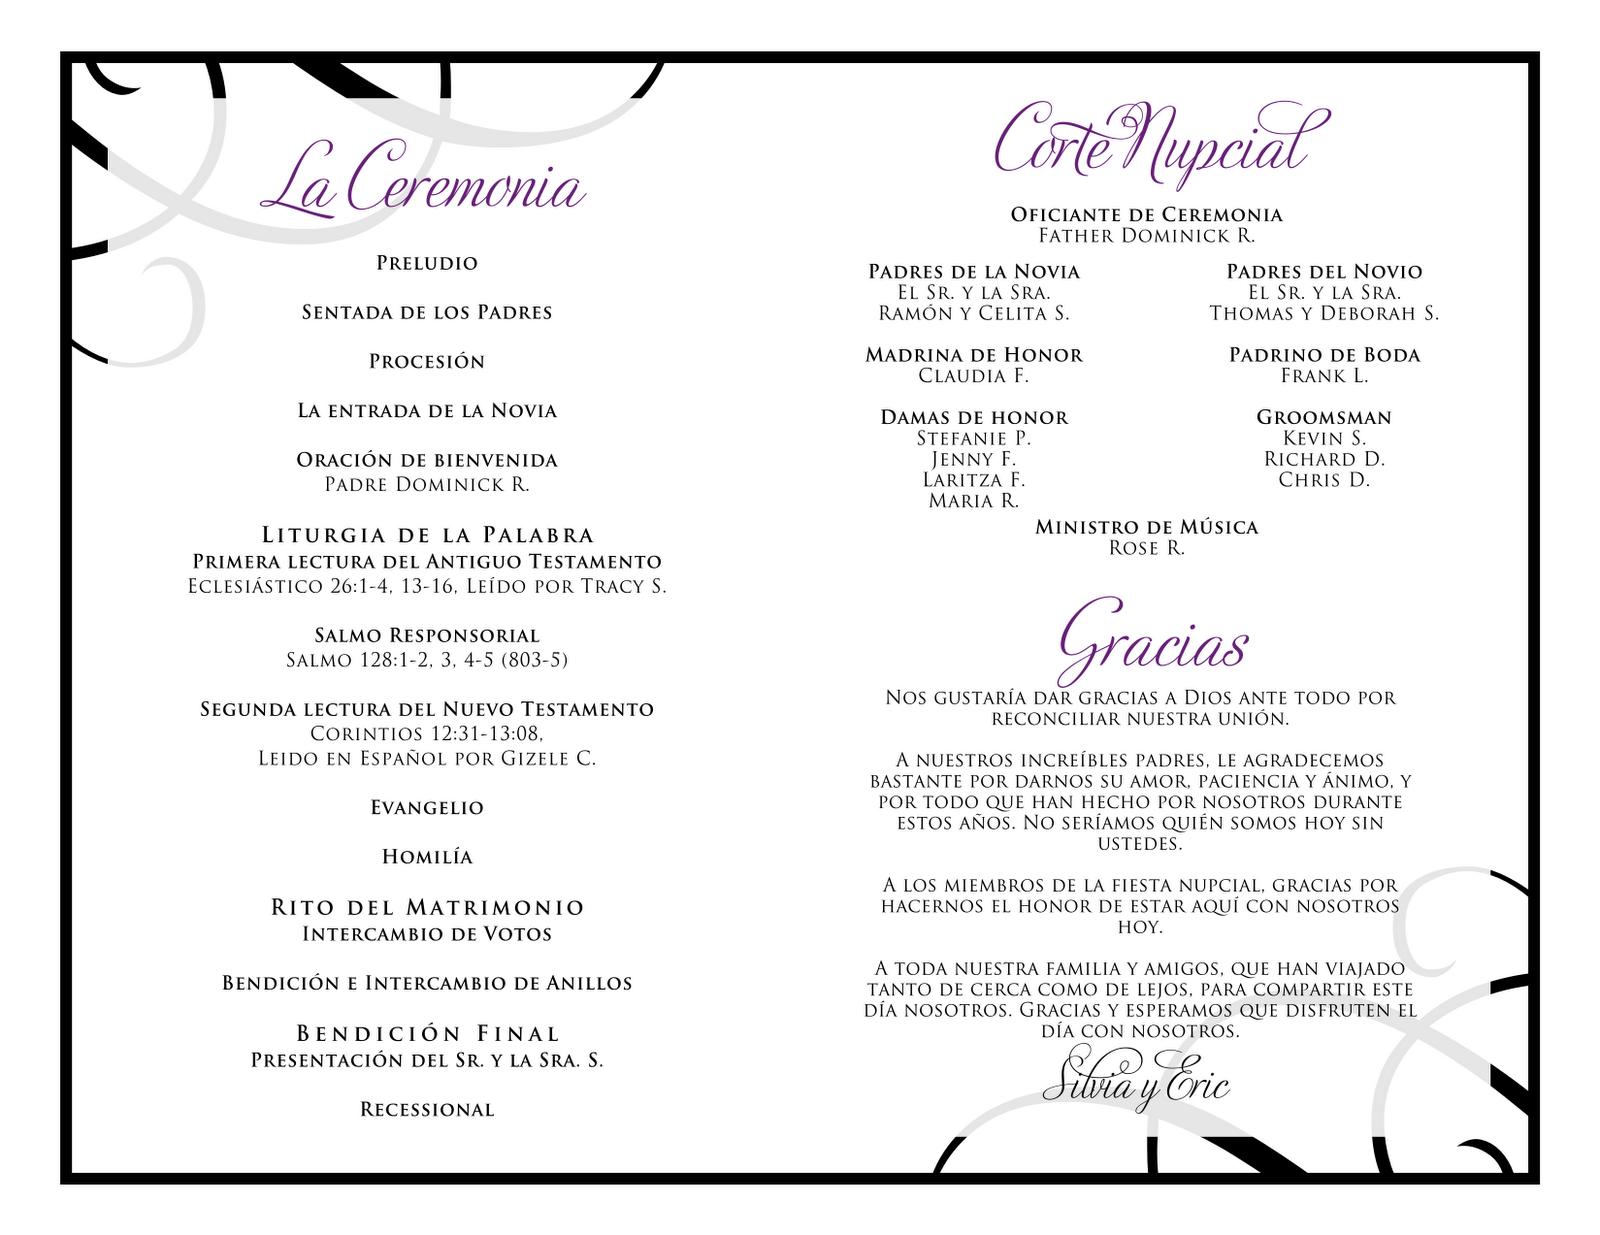 wedding programs in spanish - Google Search | Wedding Invitations ...